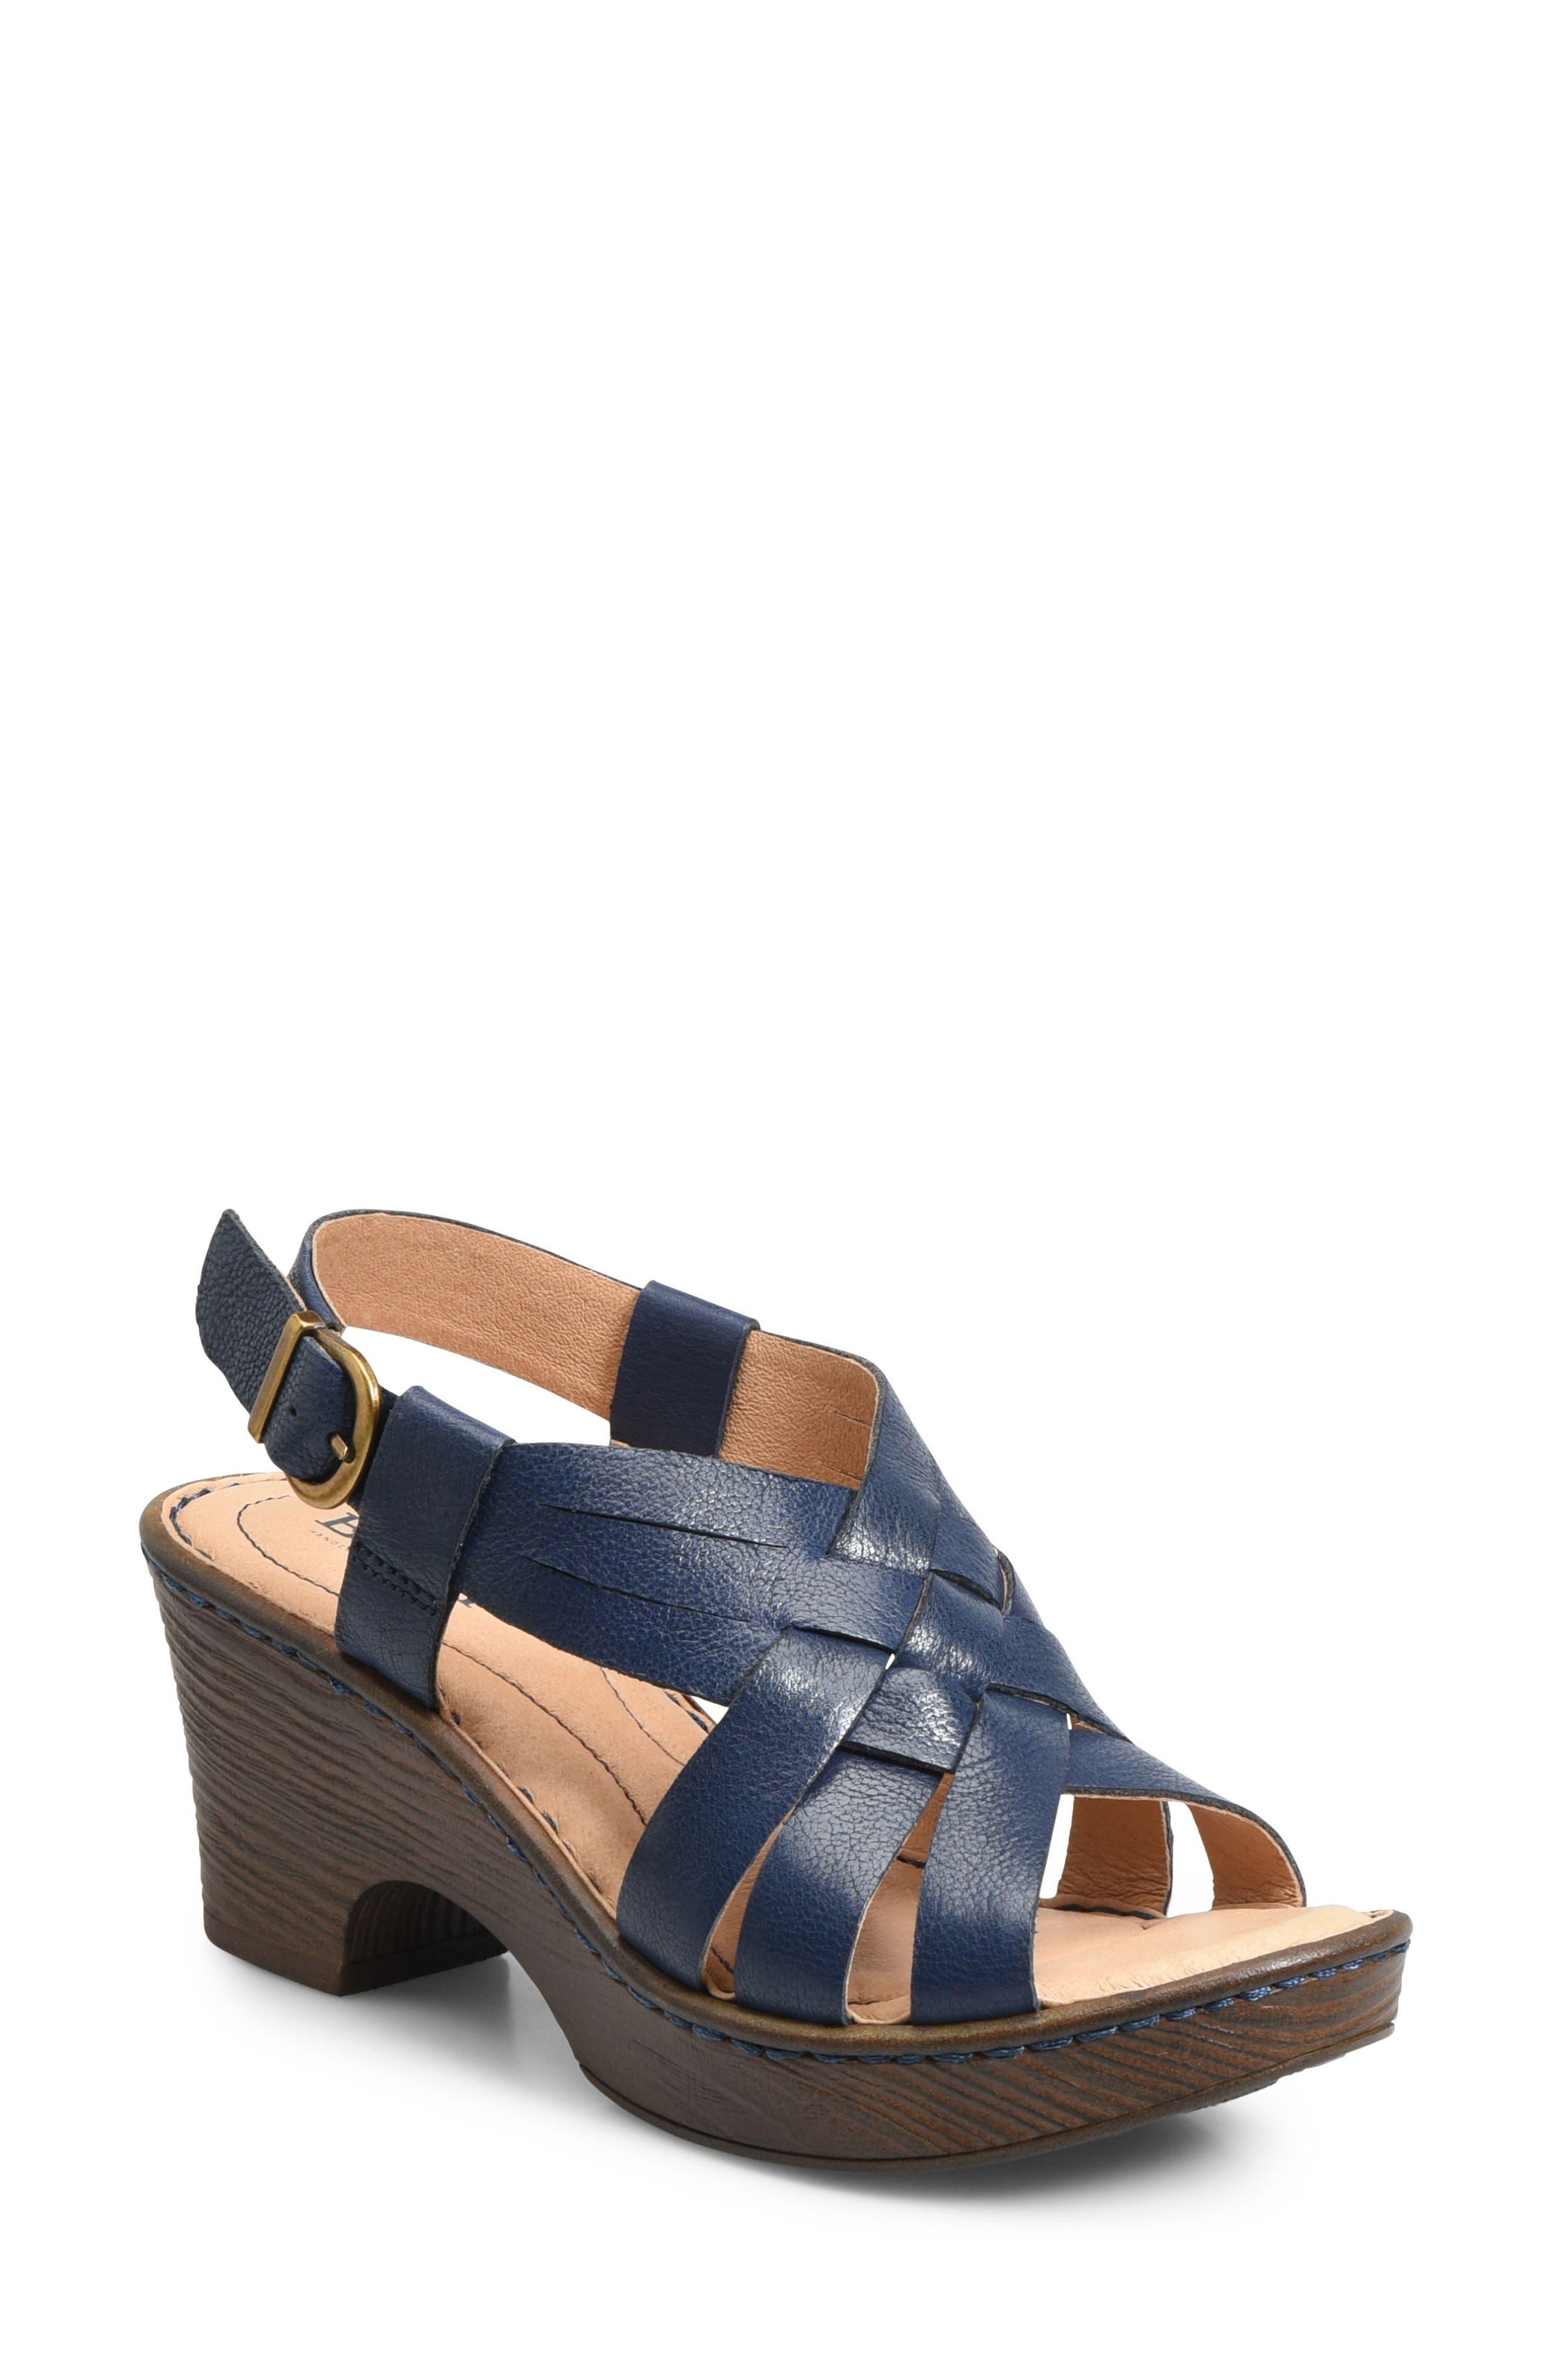 B?rn Crevalle Platform Sandal, Blue